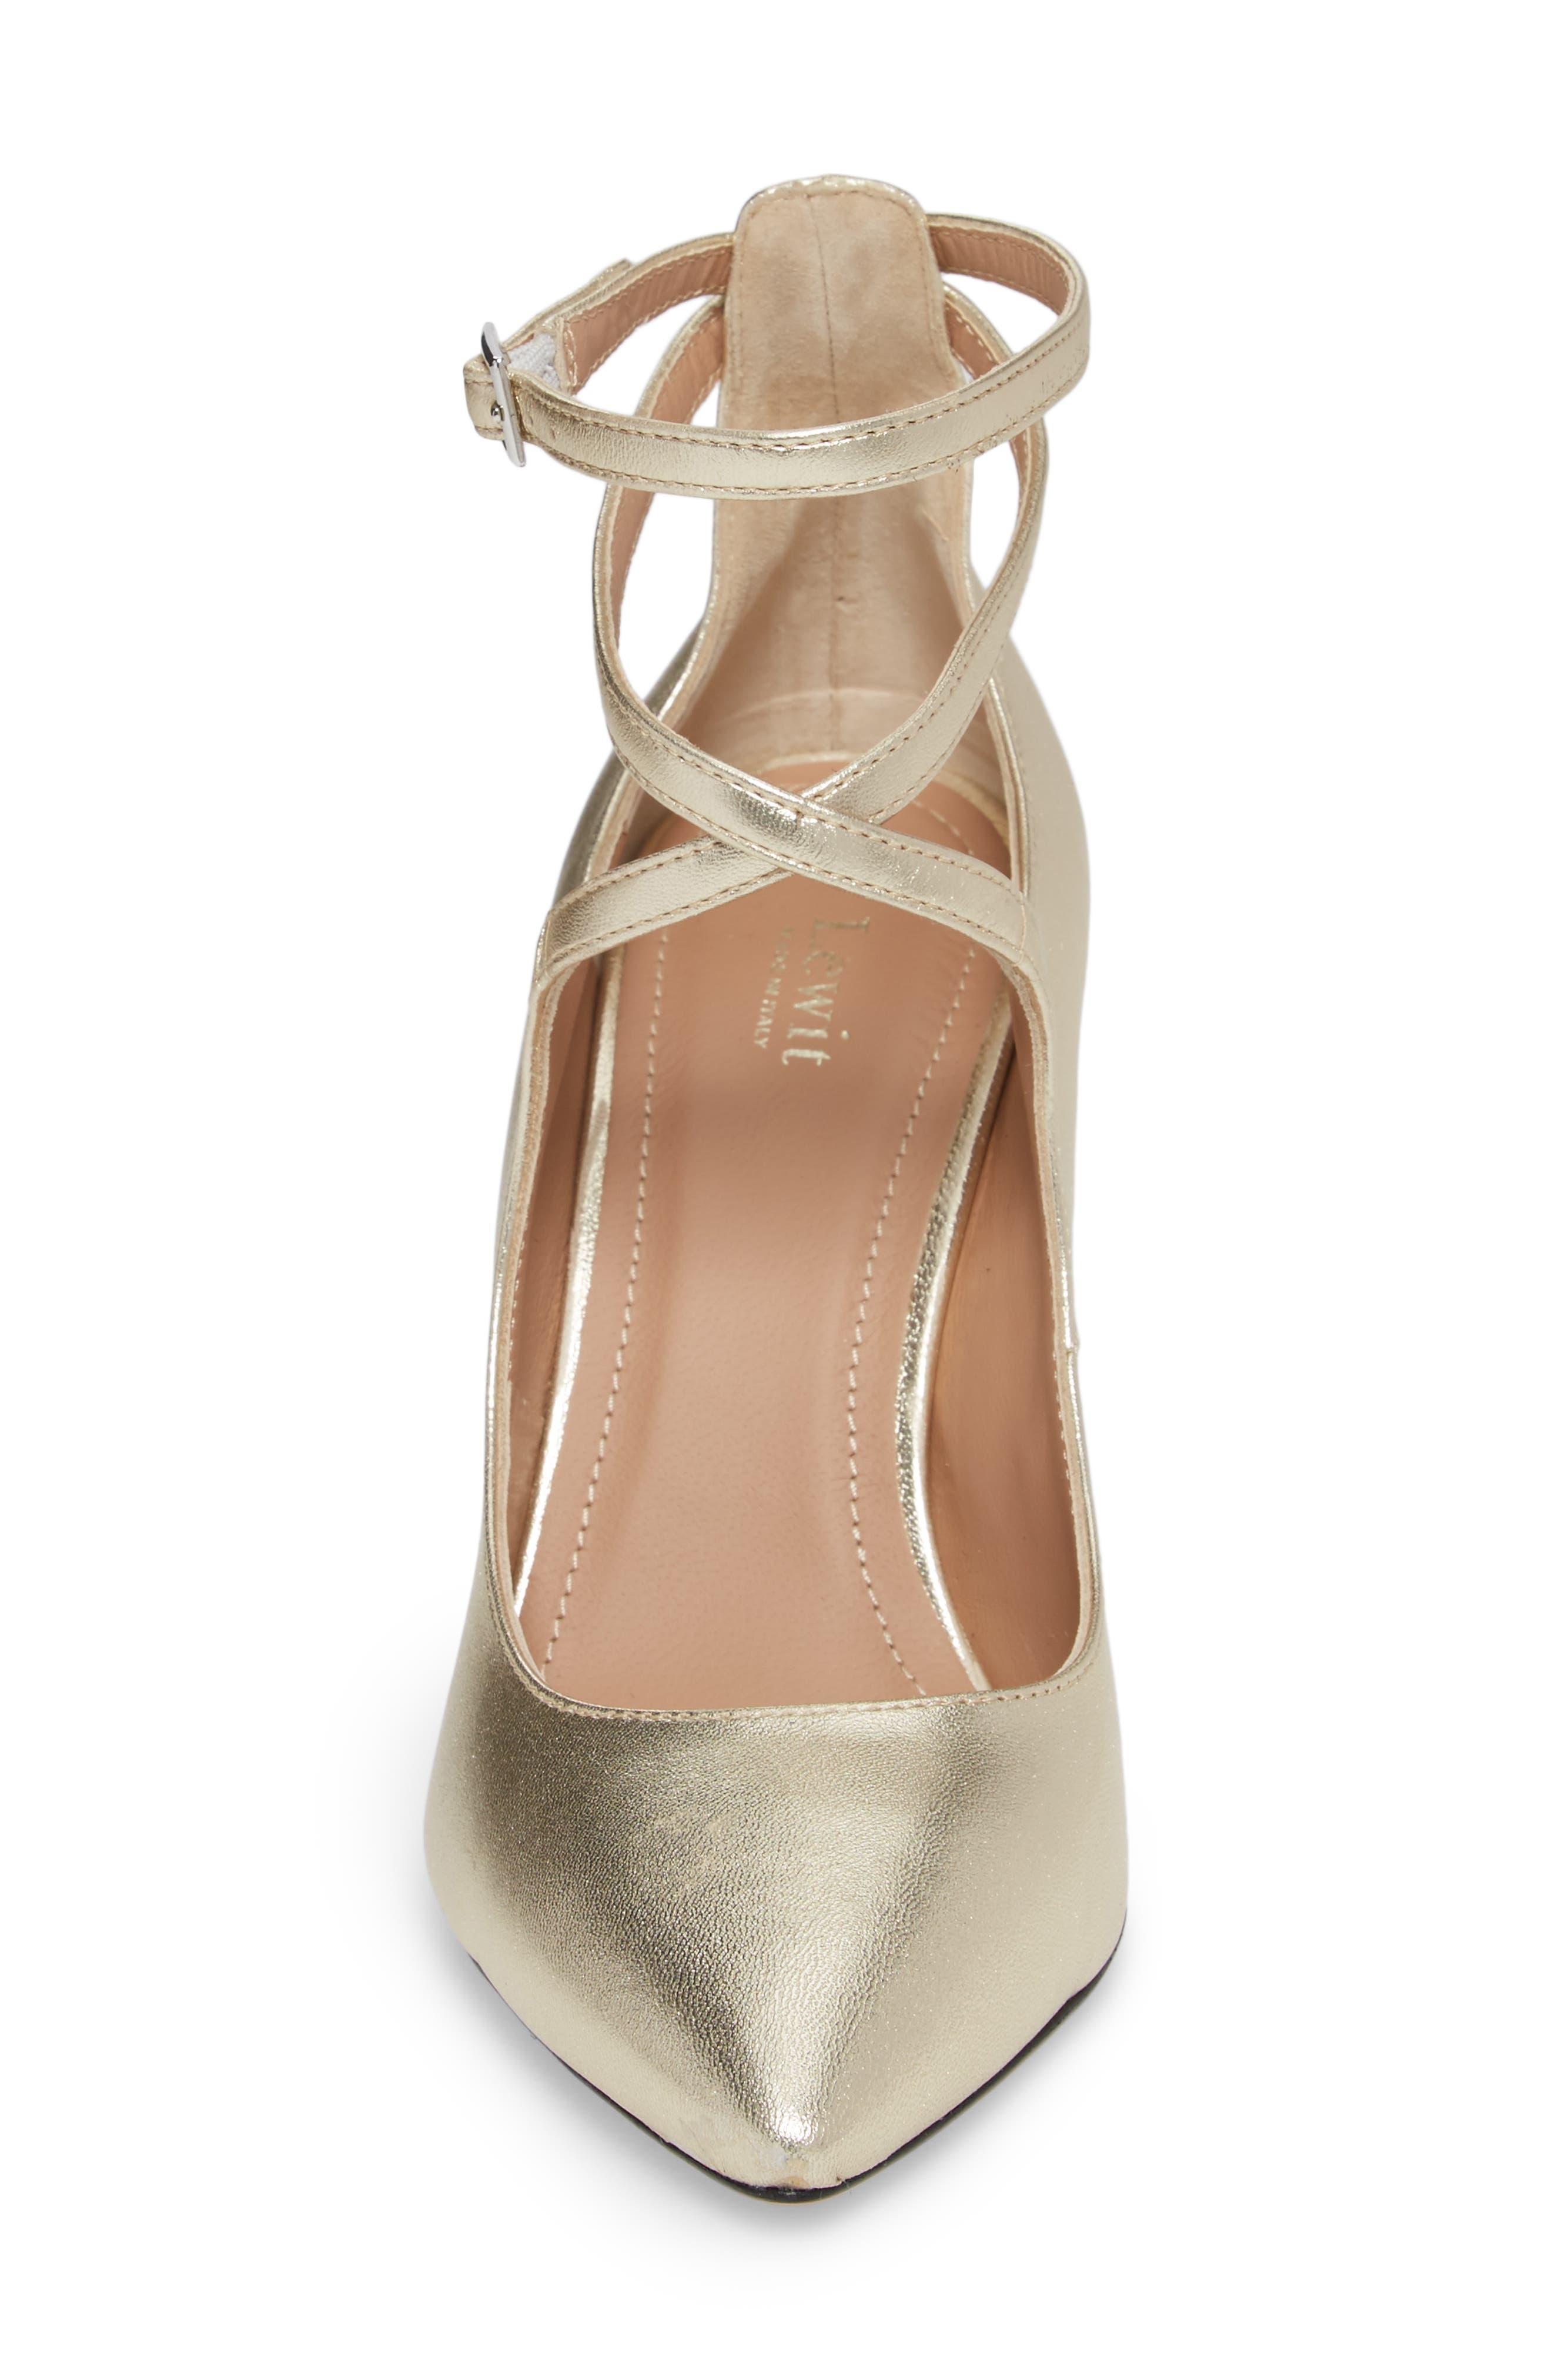 Carita Ankle Wrap Pump,                             Alternate thumbnail 4, color,                             Platino Leather